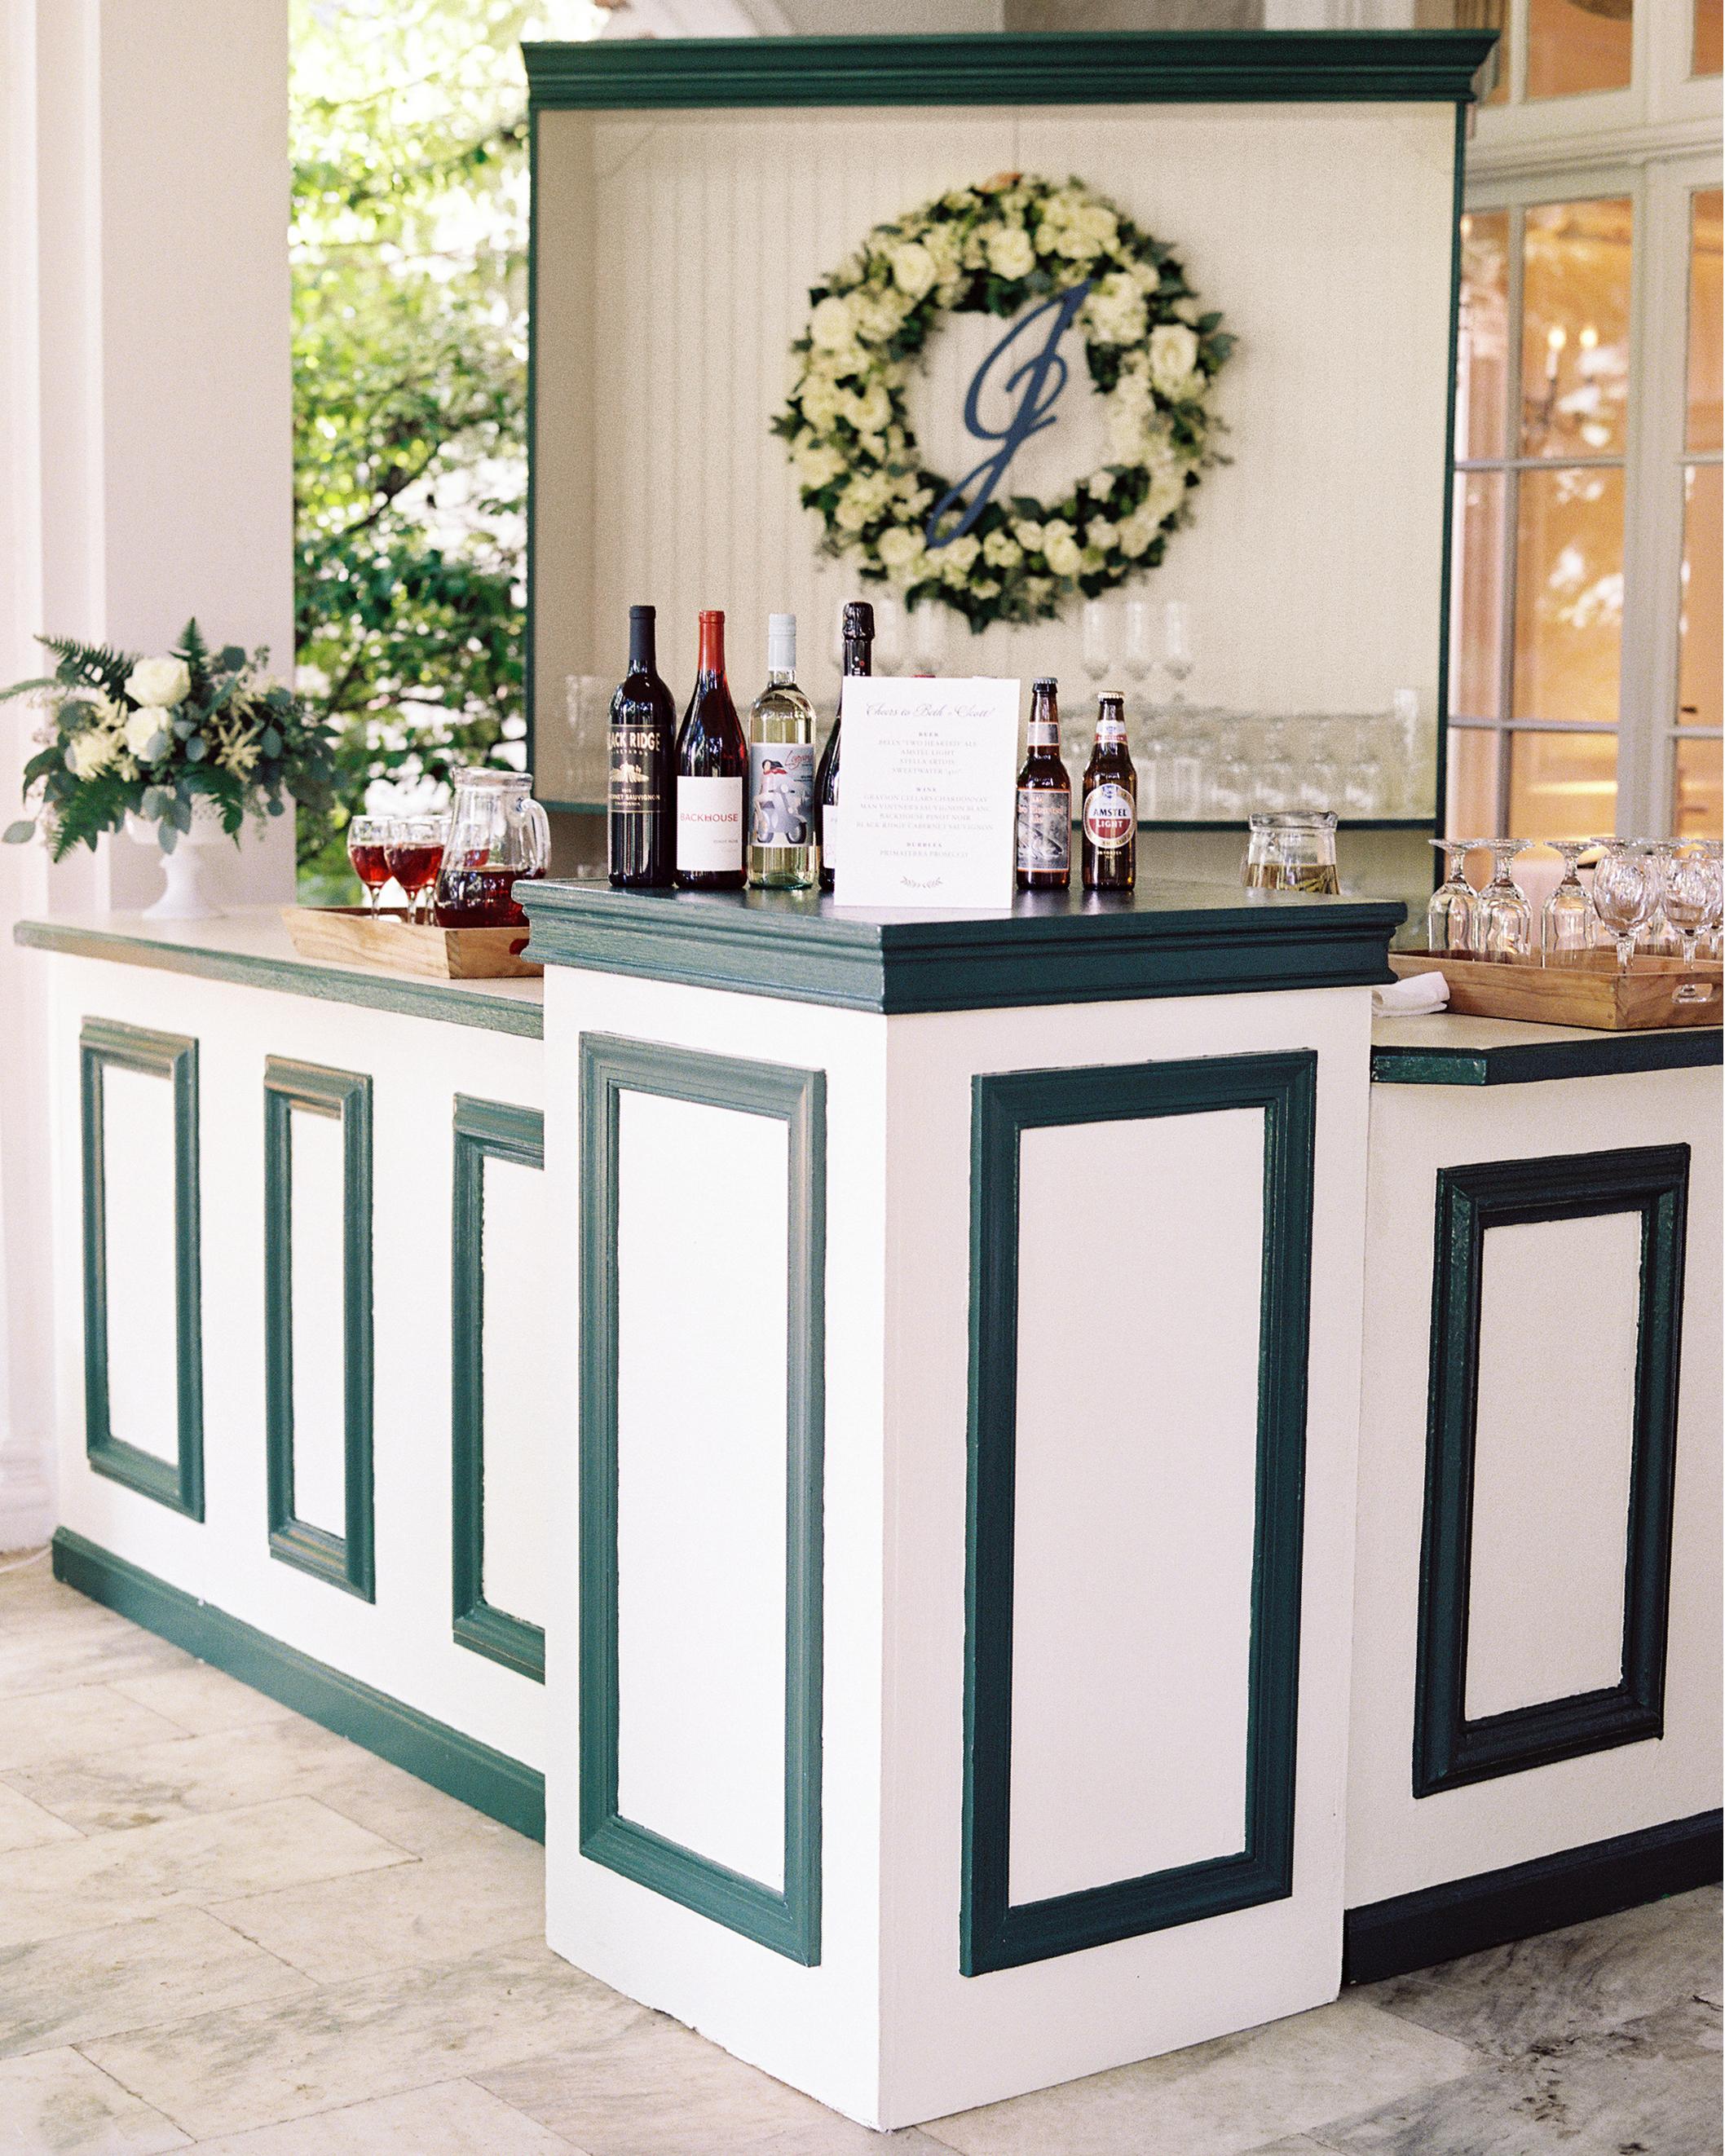 beth-scott-wedding-bar-0648-s112077-0715.jpg